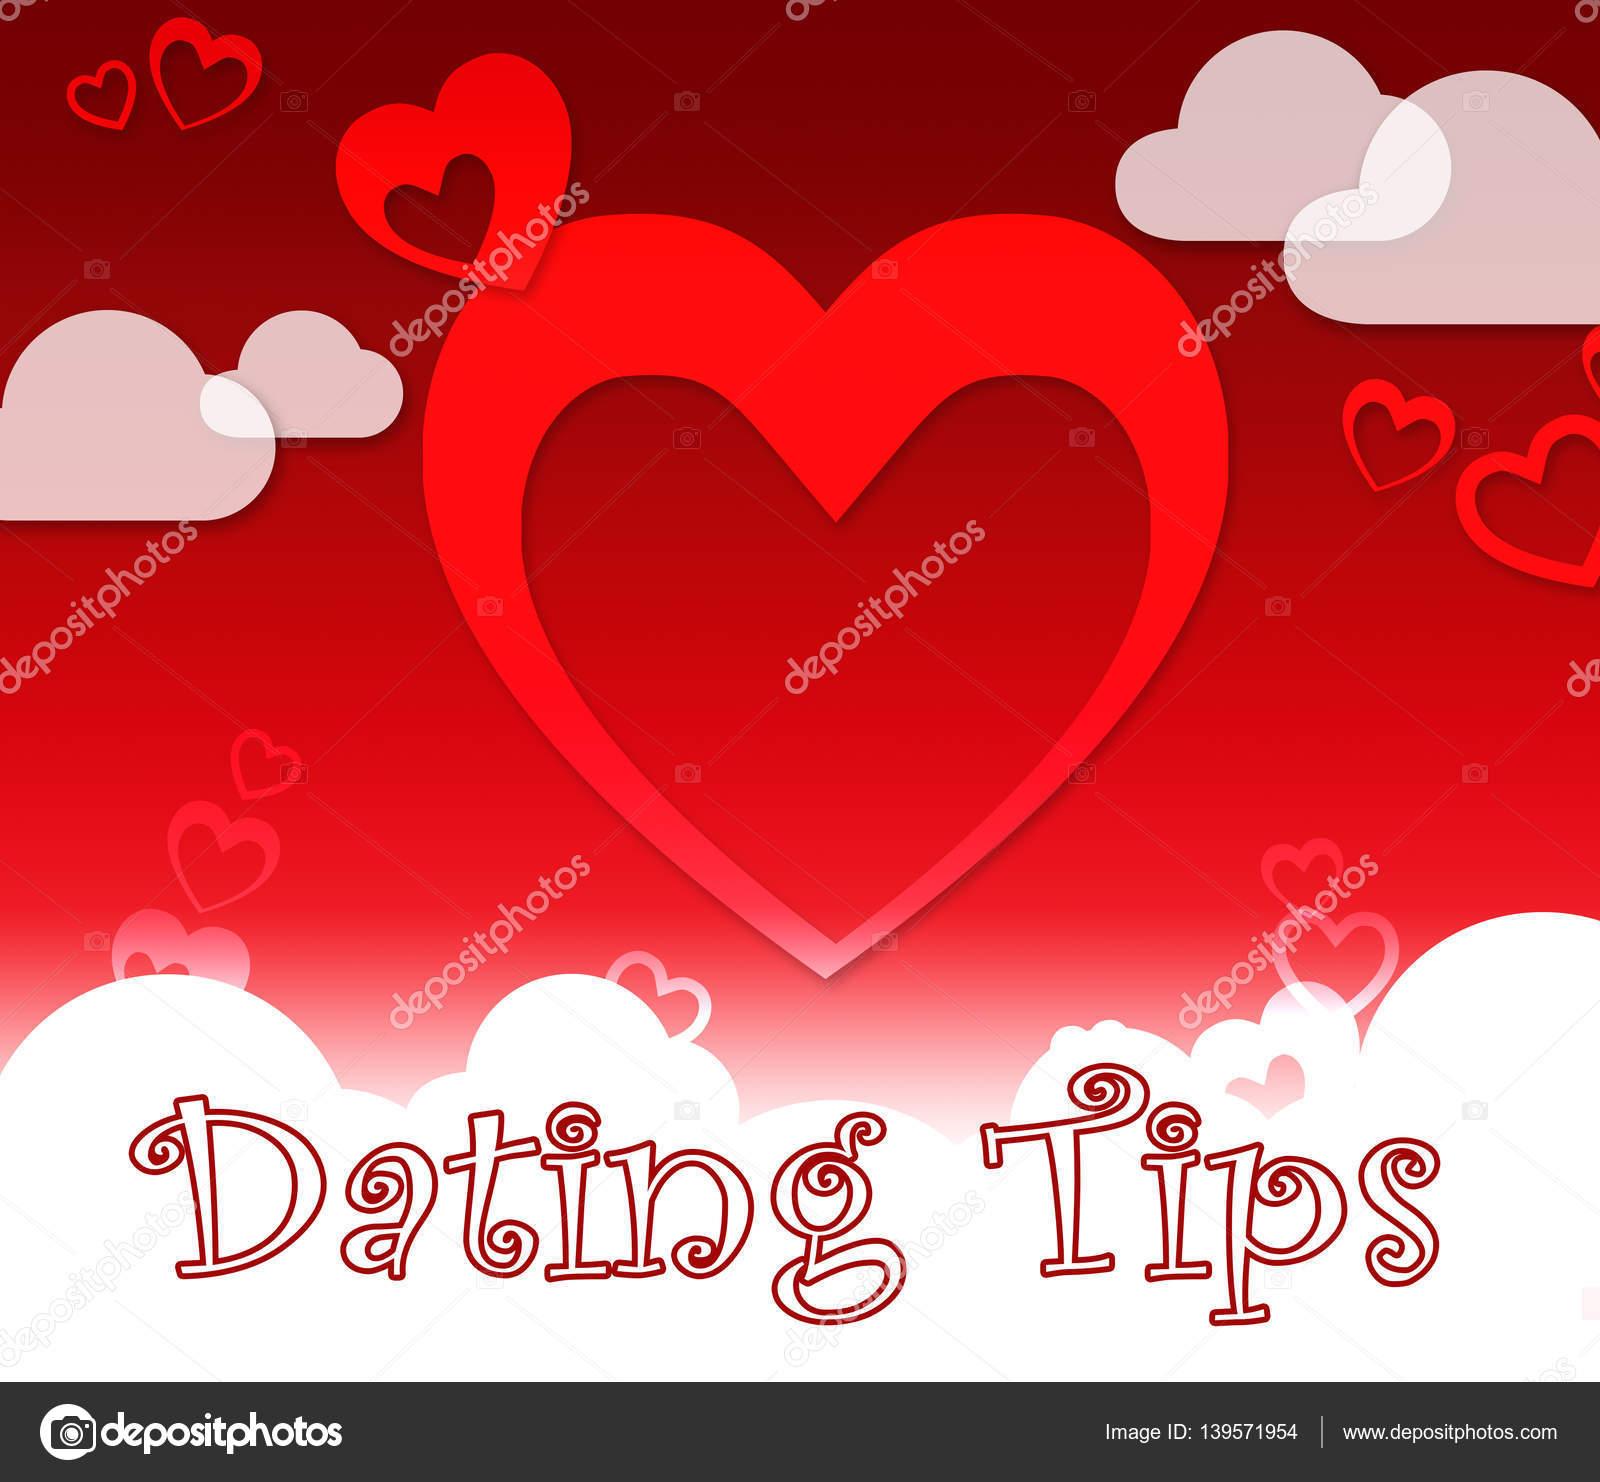 I love dating tips #9